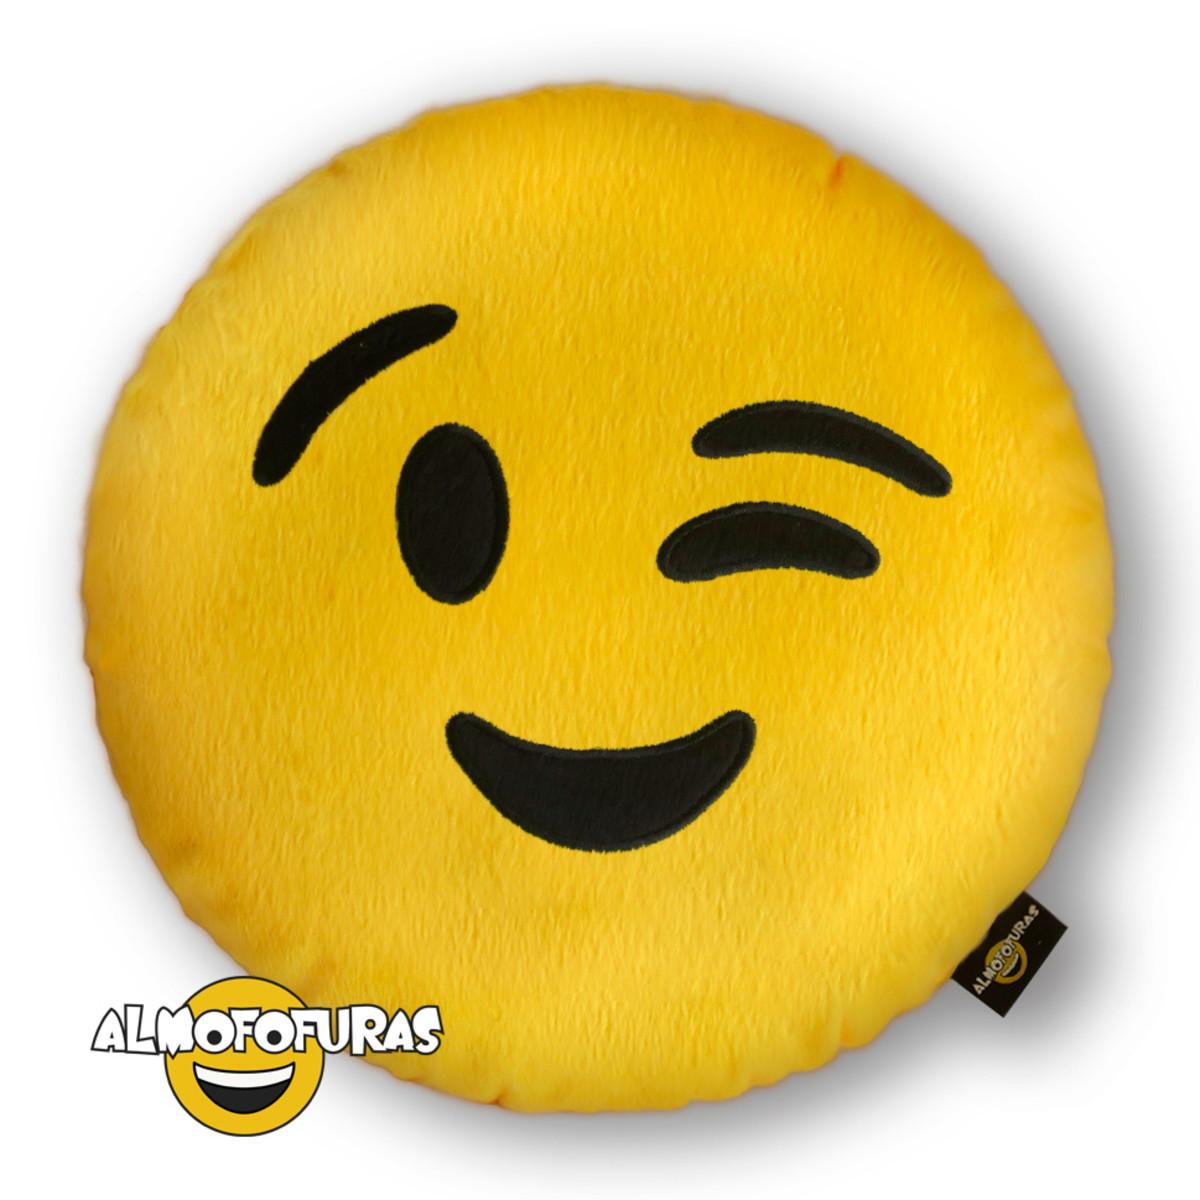 Almofada Emoji Pelúcia Bordada Whatsapp Piscando Piscada no Elo7 ... 3e6c224143